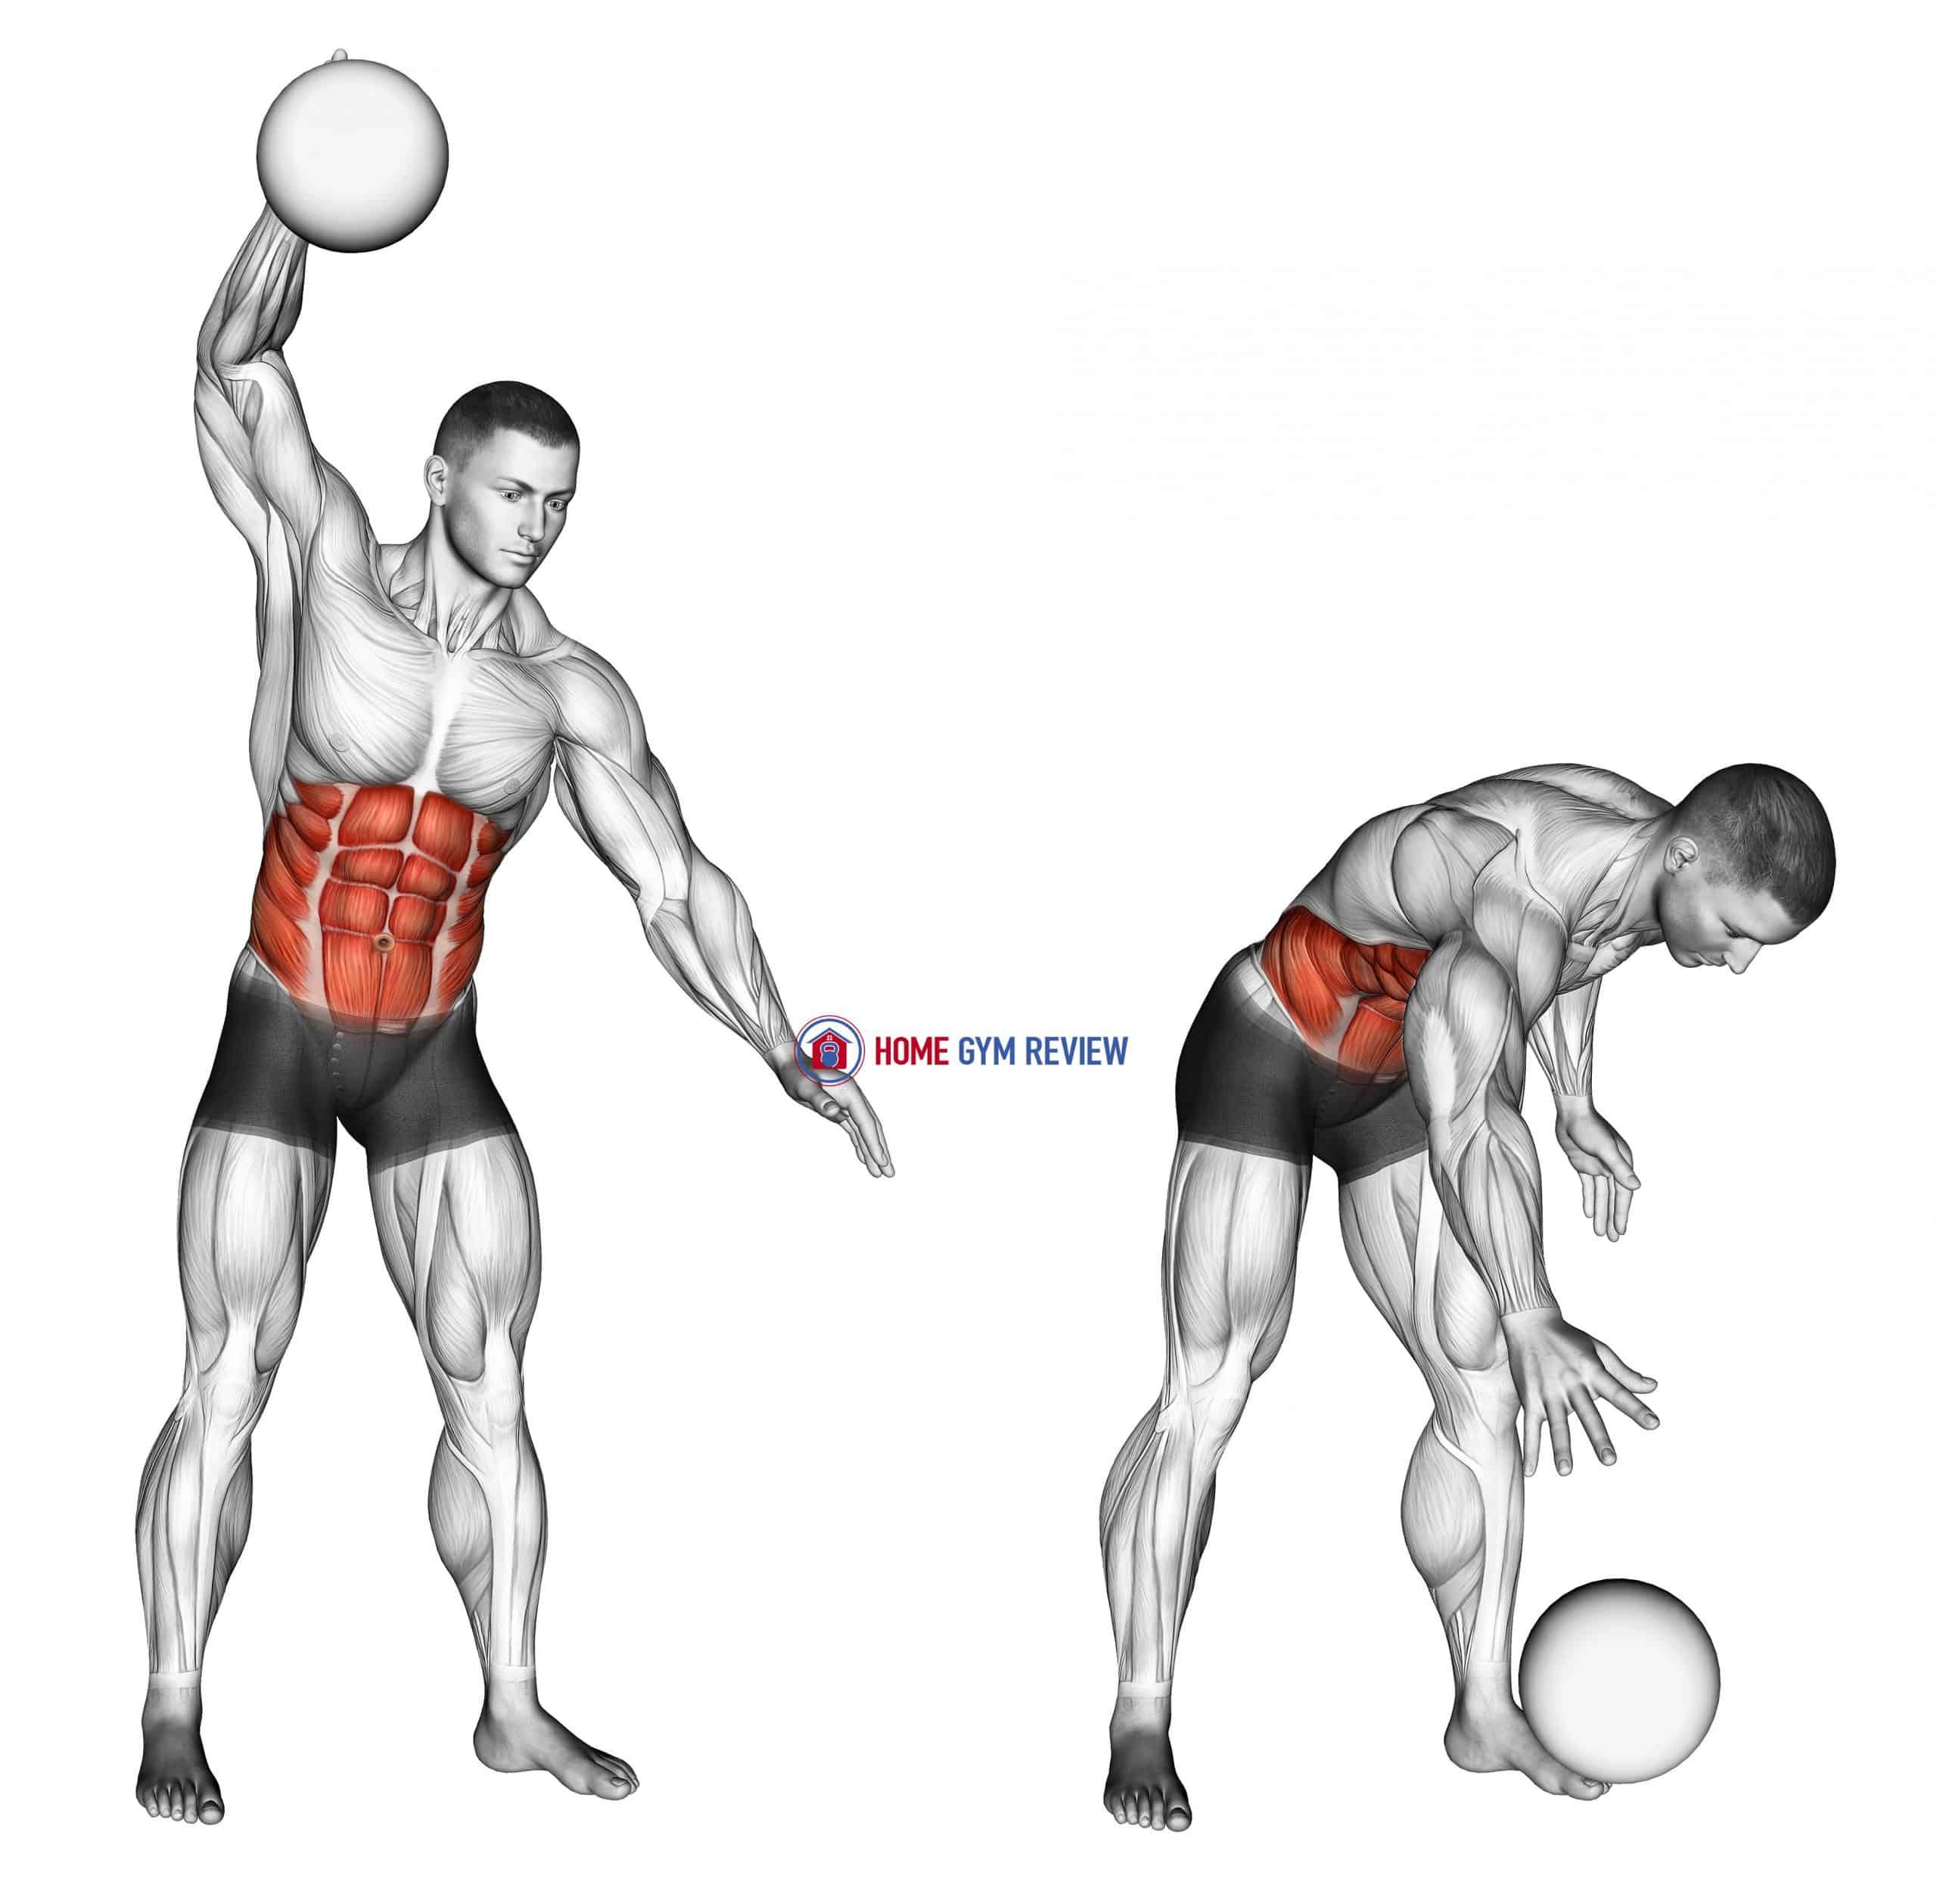 One Arm Slam (with medicine ball)